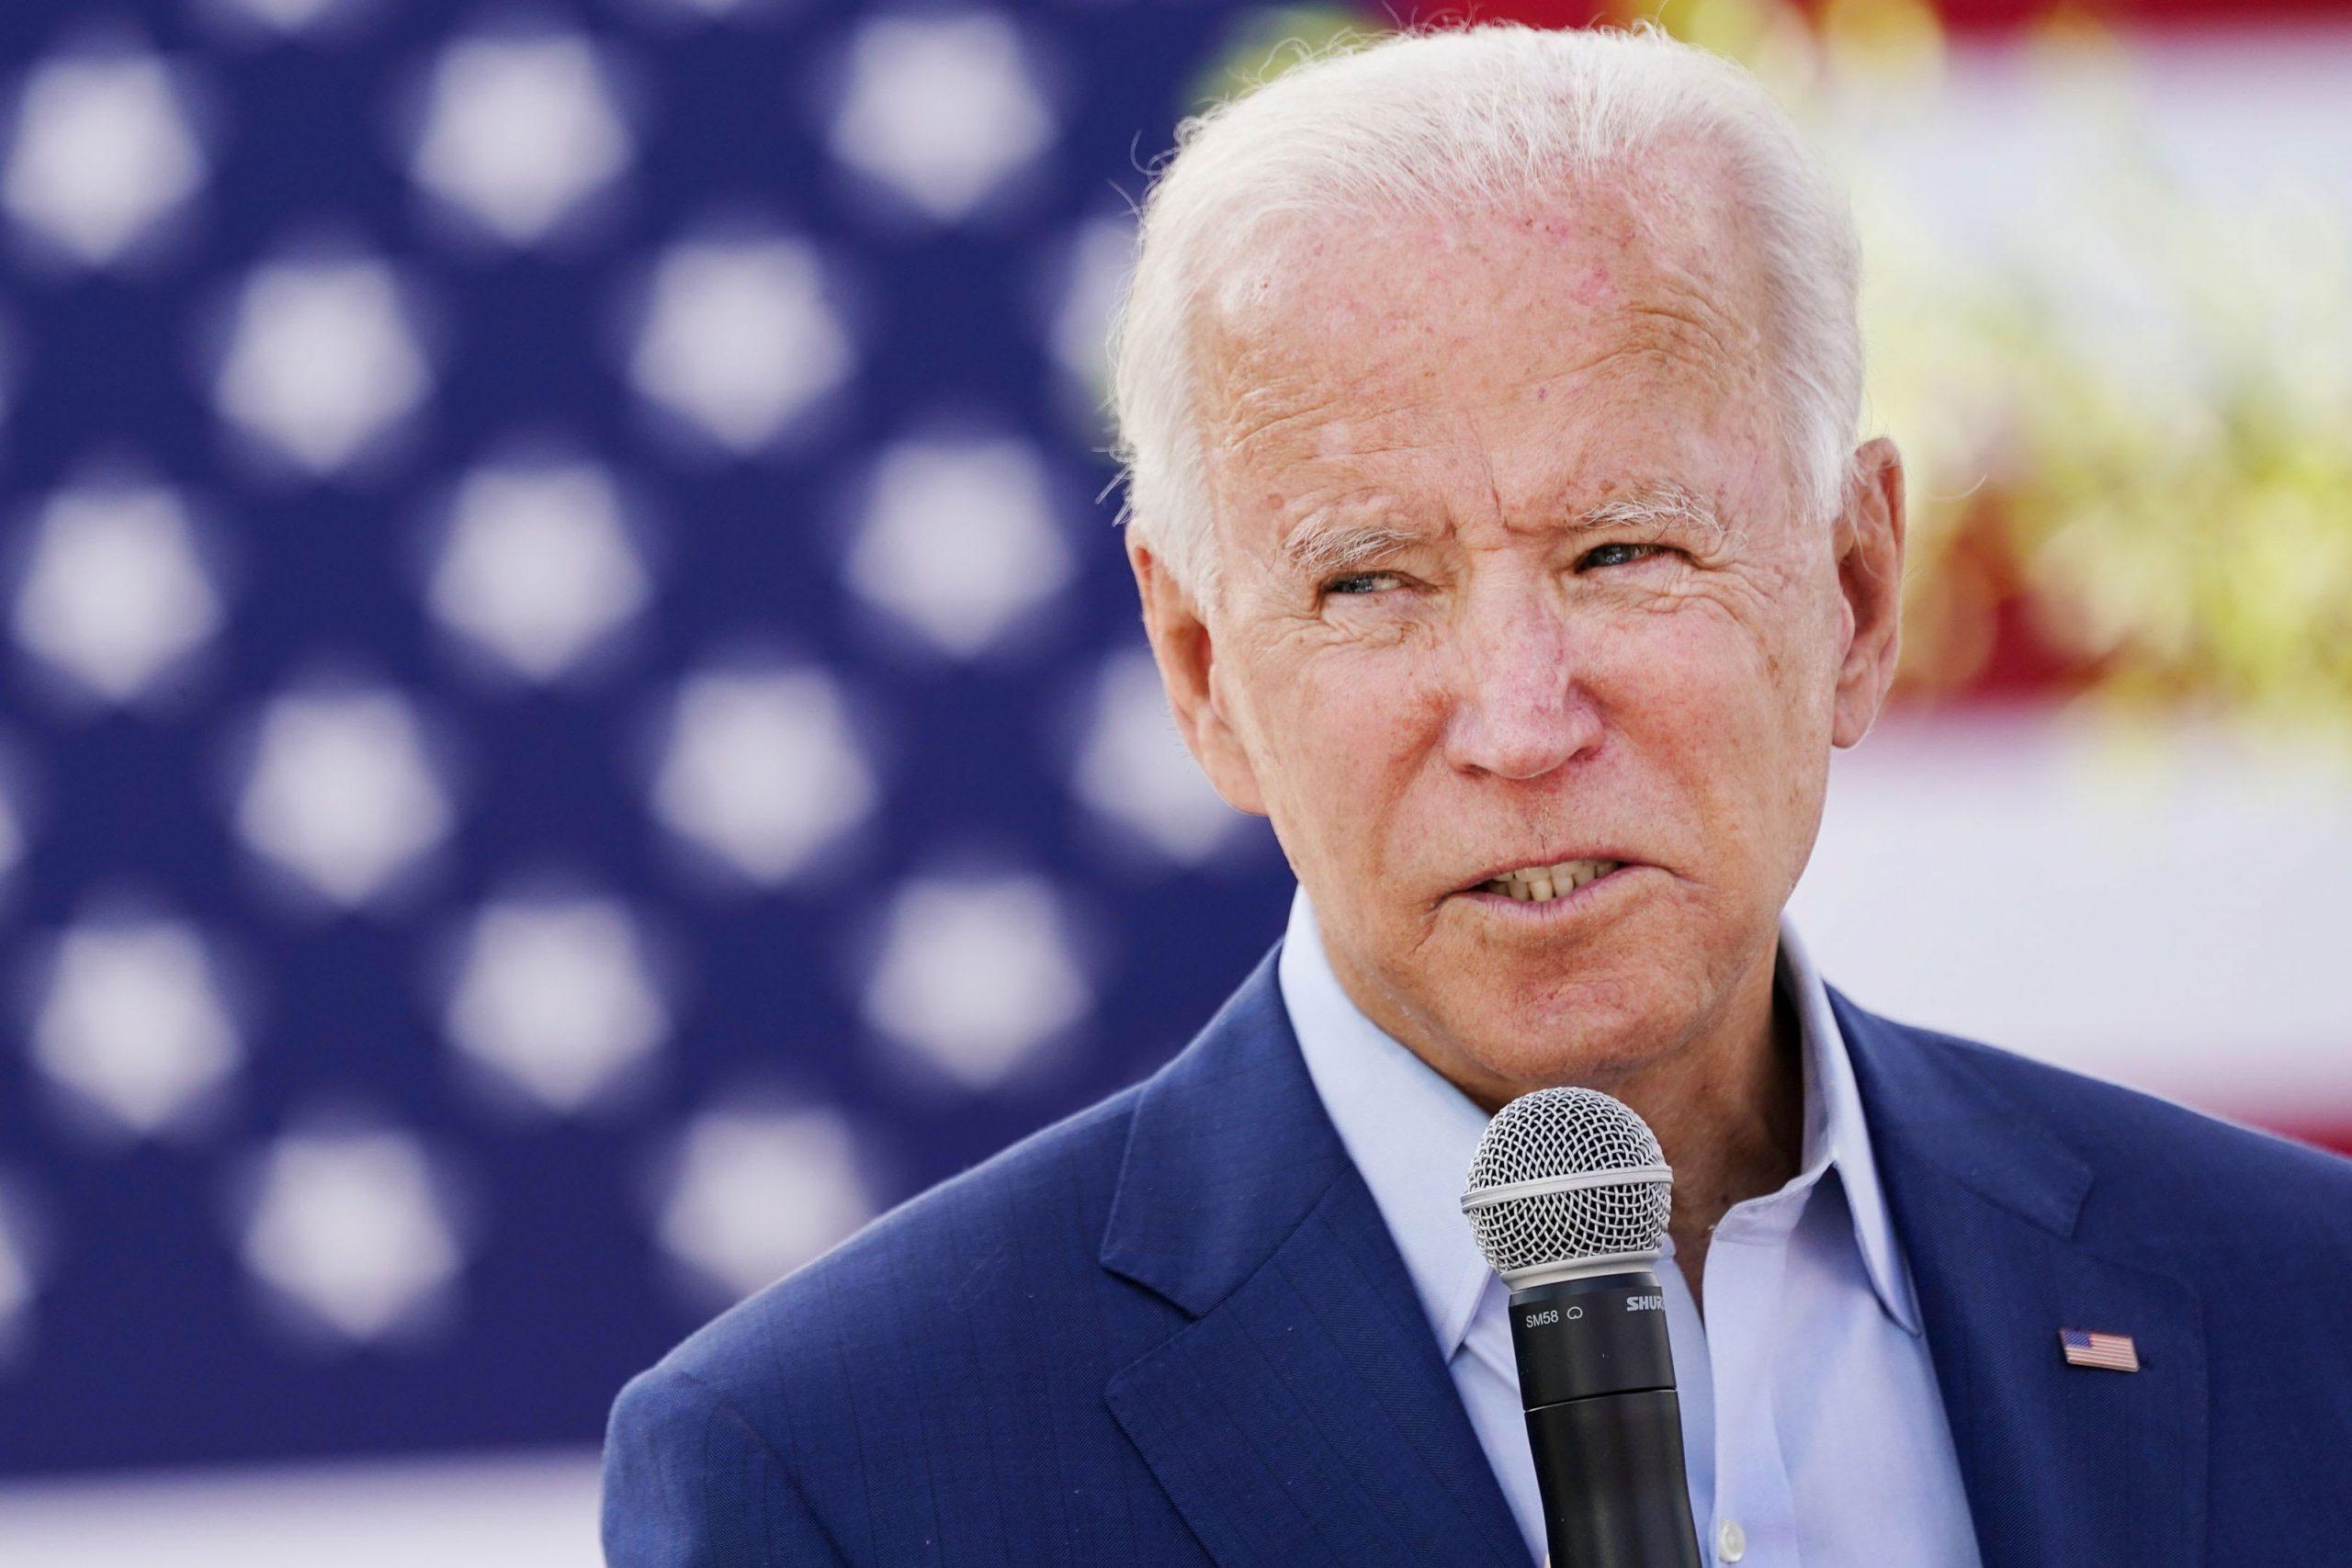 Democrats avoid discussing Joe Biden's slave owning ancestors